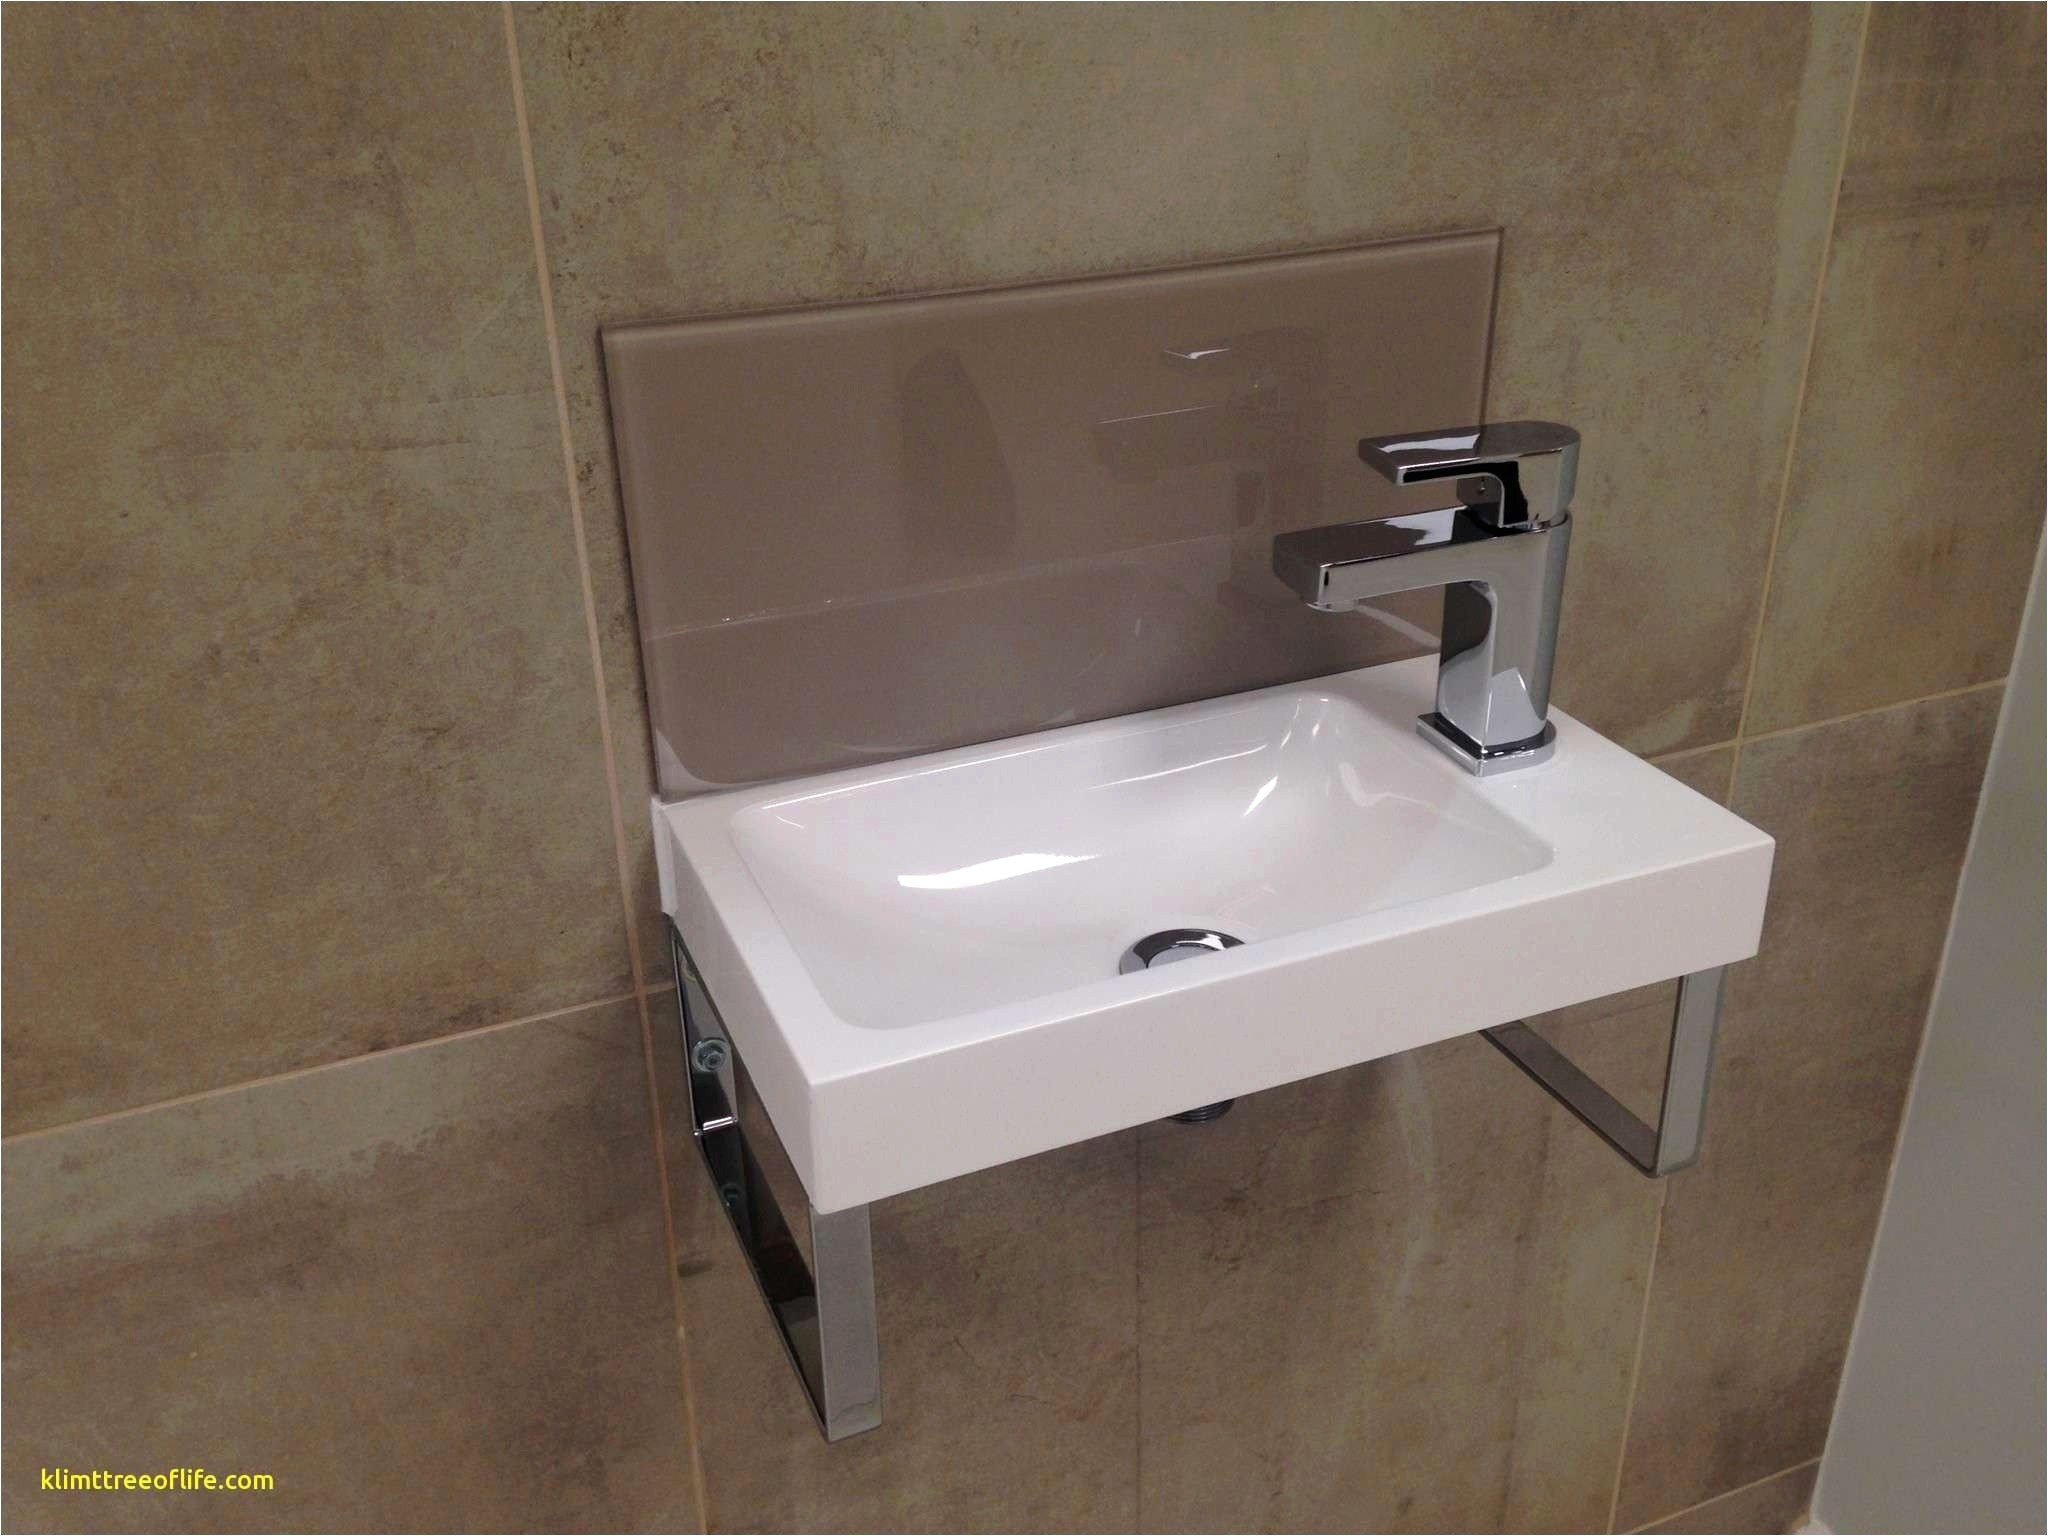 handicap bathtub wallpaper for bathrooms ideas tile bathroom ideas new tag toilet